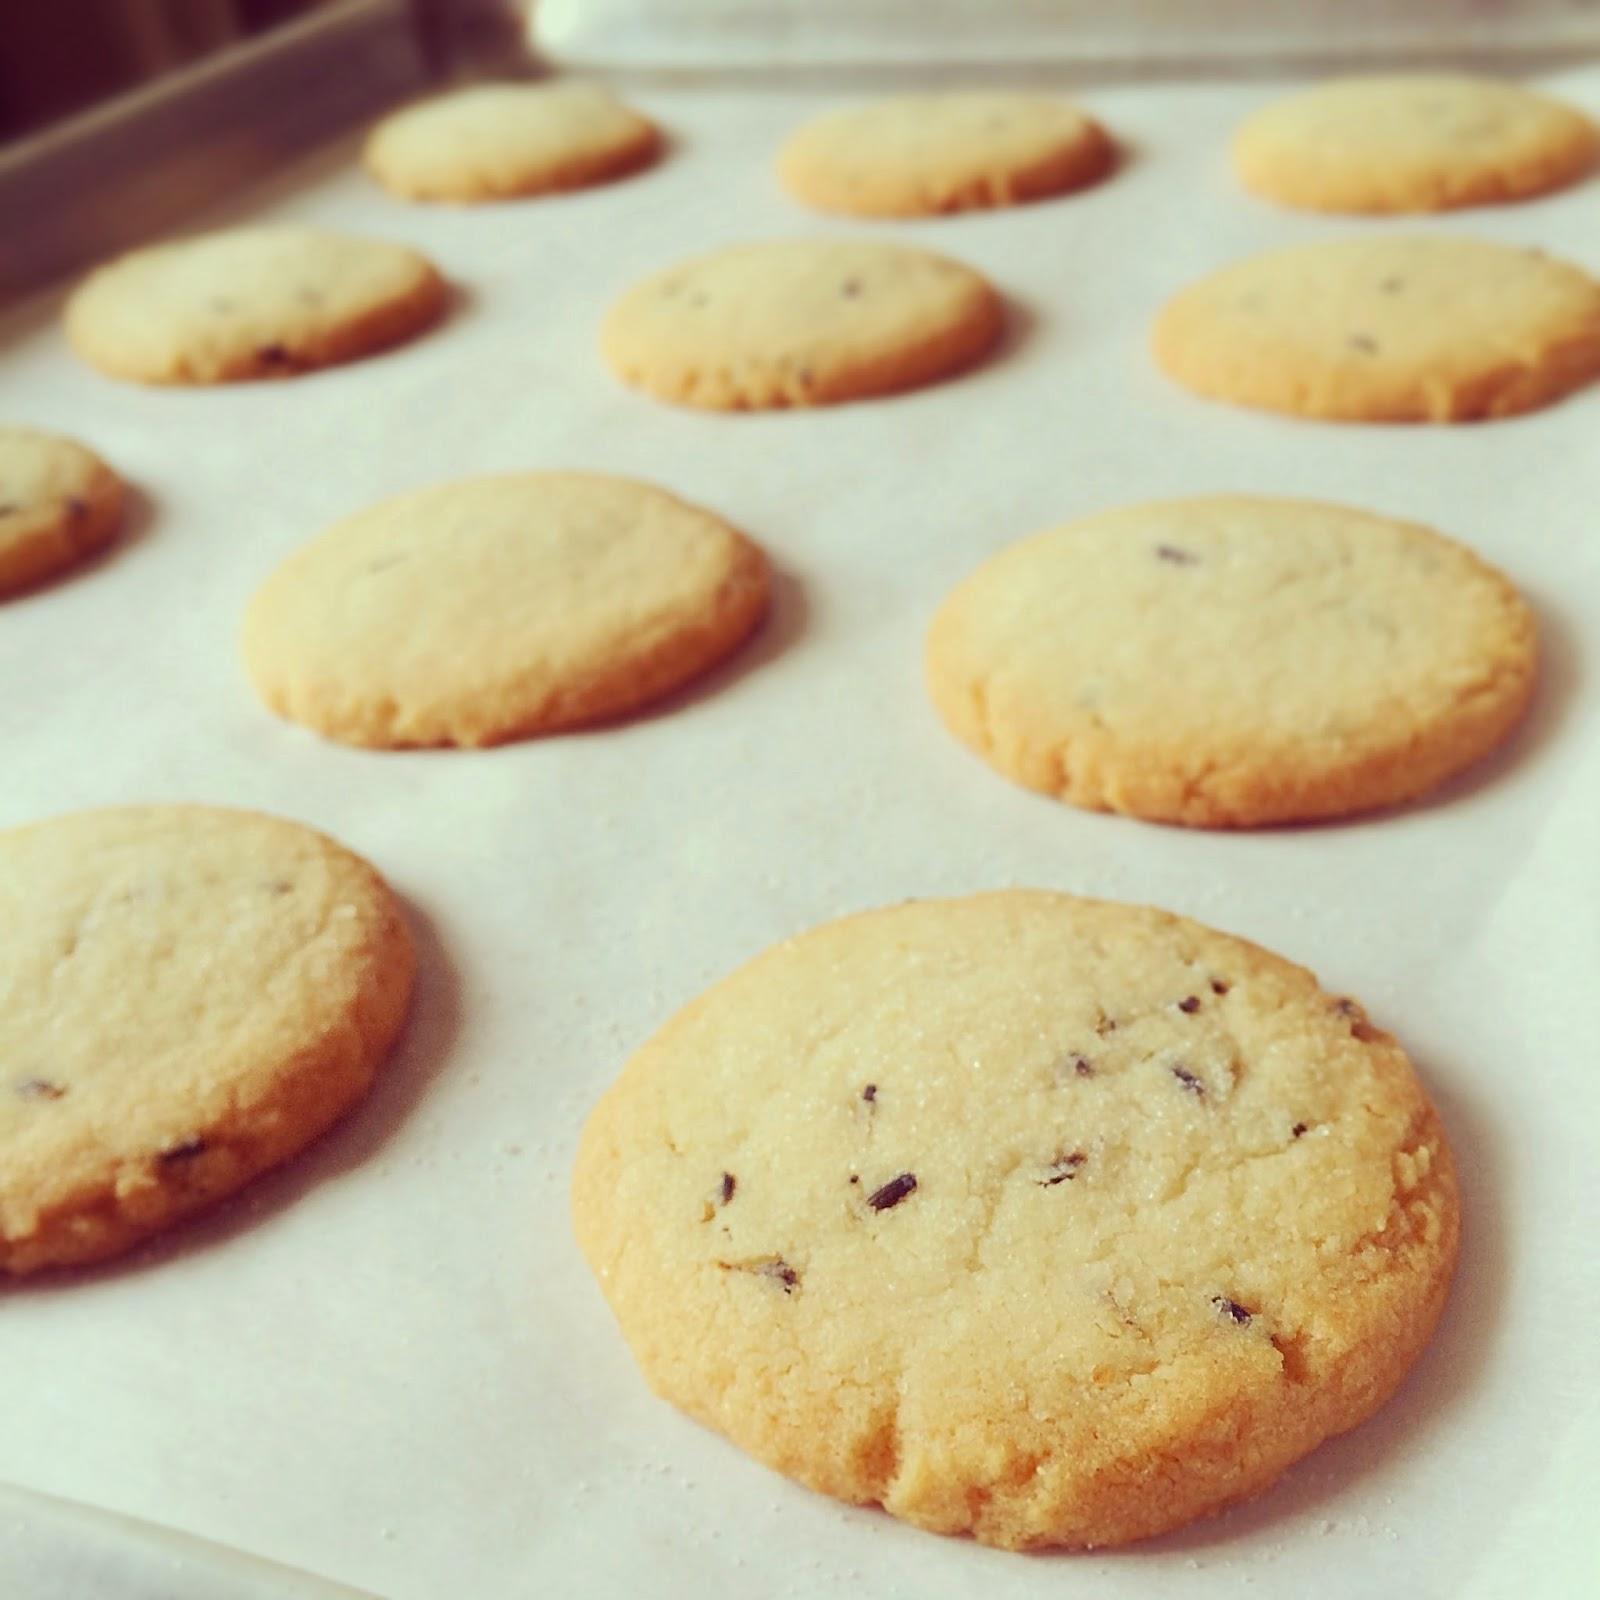 Art of Dessert: Lemon and Lavender Shortbread Cookies